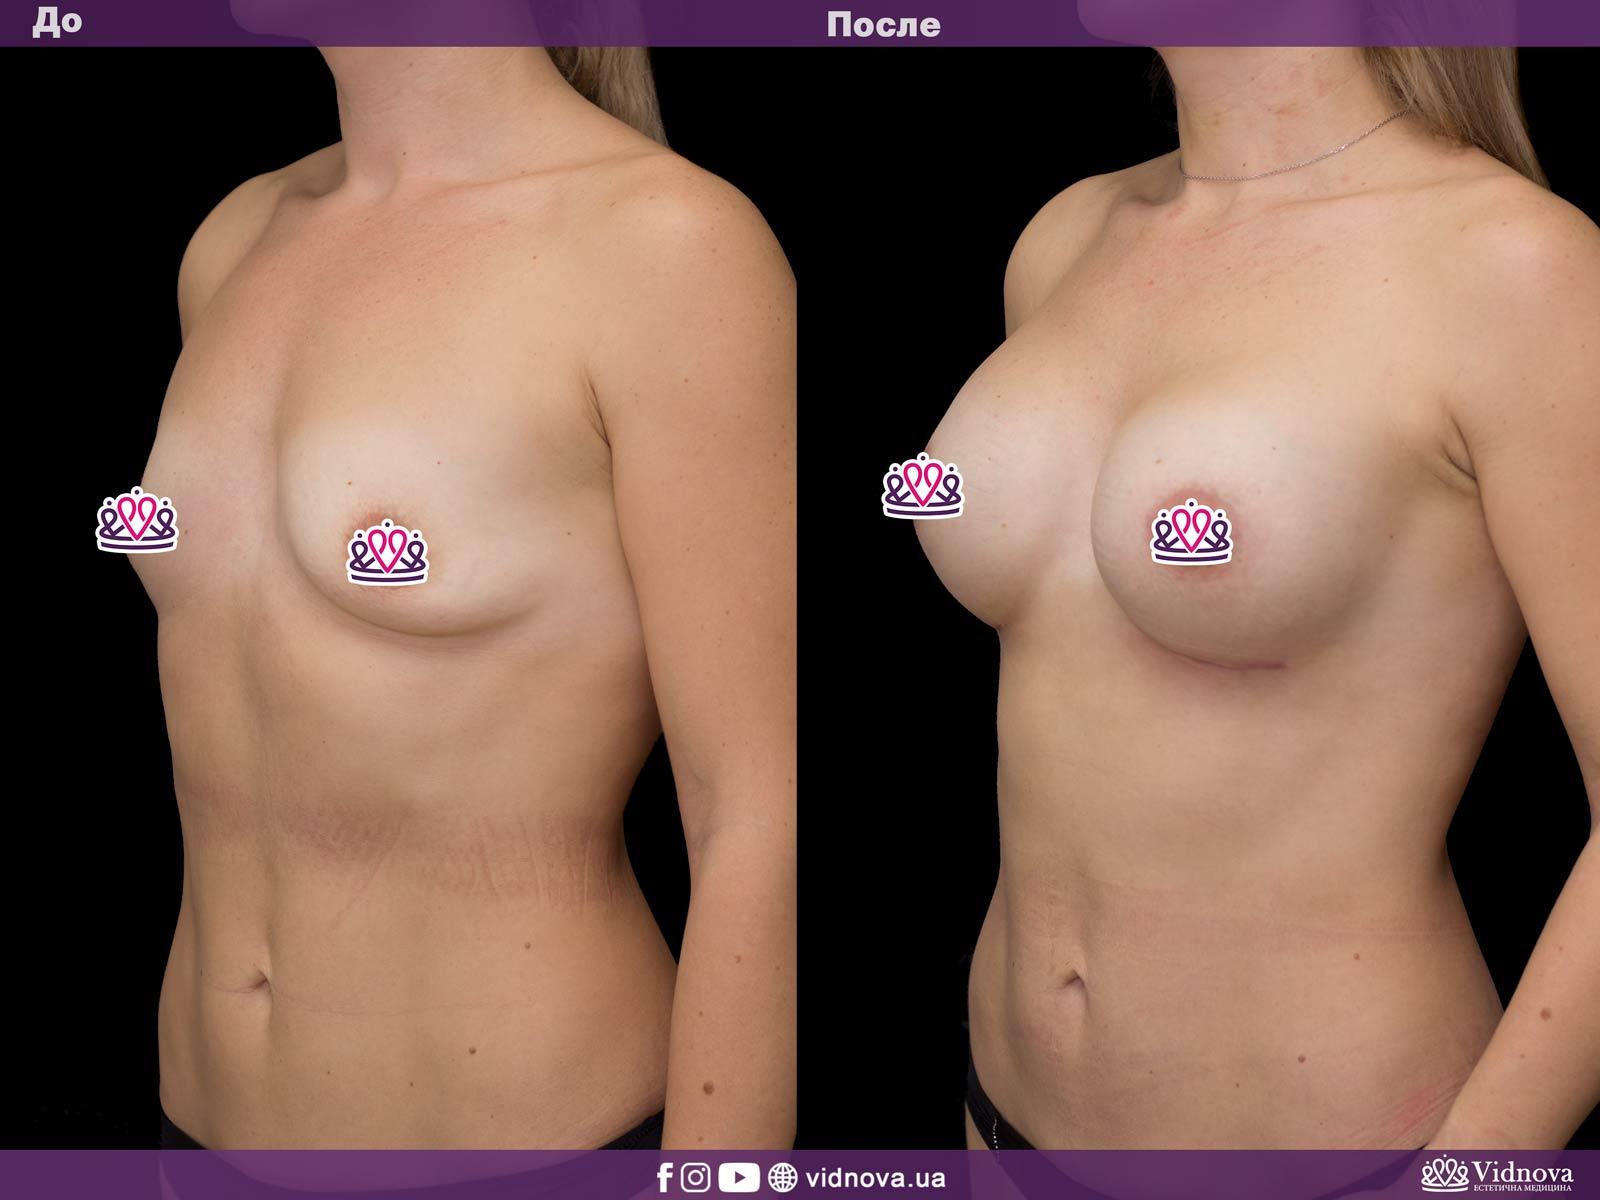 Увеличение груди: Фото ДО и ПОСЛЕ - Пример №28-2 - Клиника Vidnova